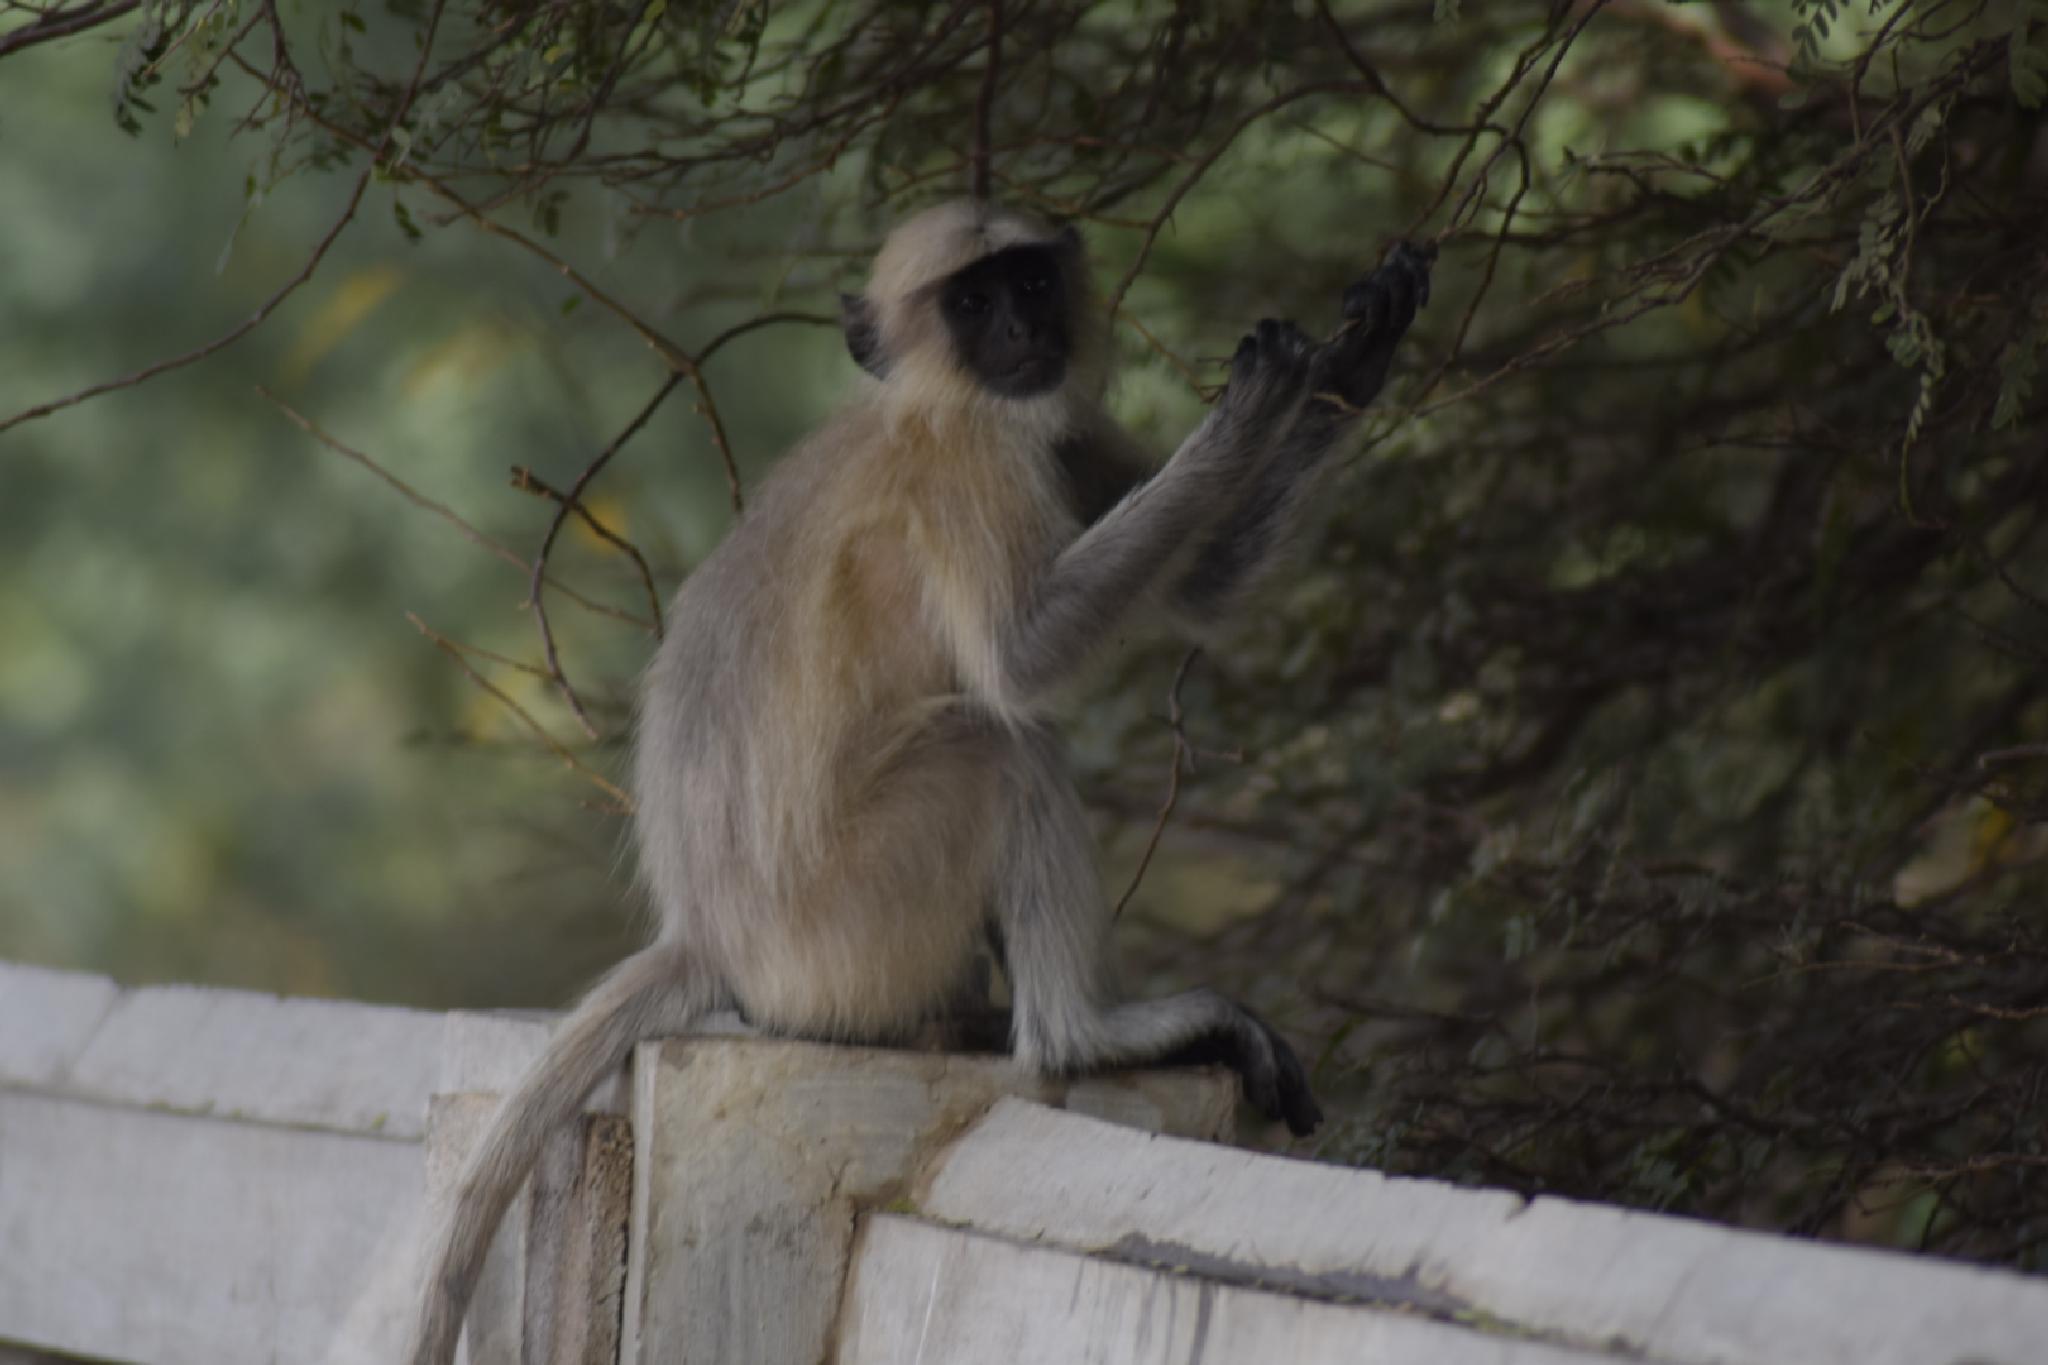 A baby monkey by Clicks_ravi